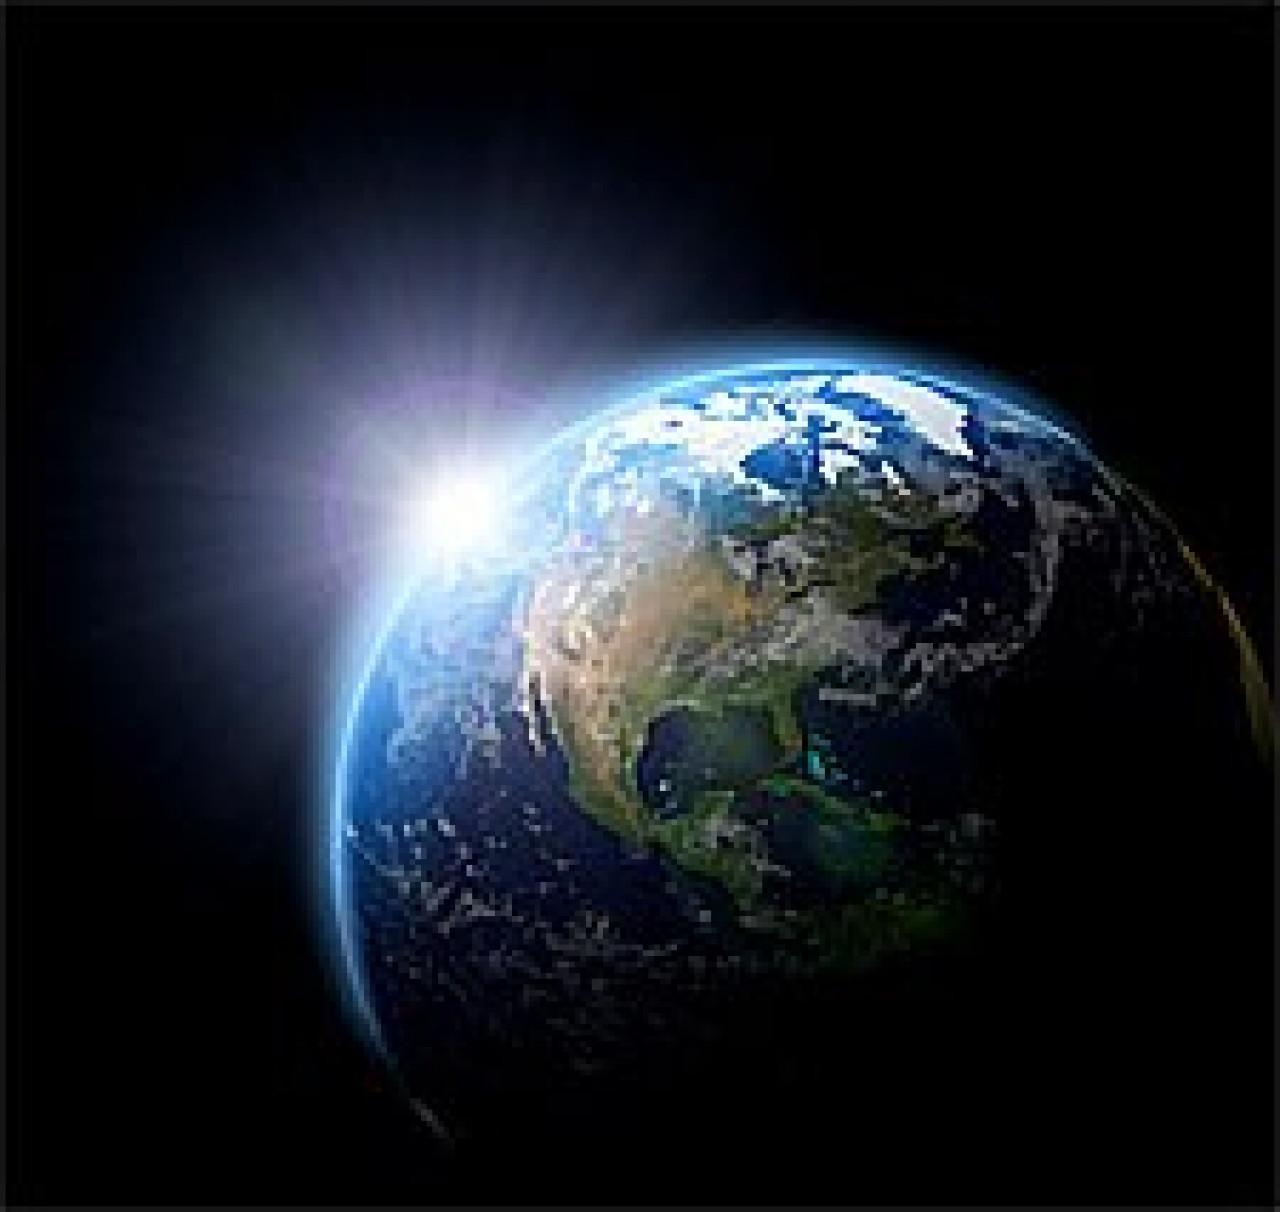 Worldwide Peace Healing Through Prayer Planet Earth Space View